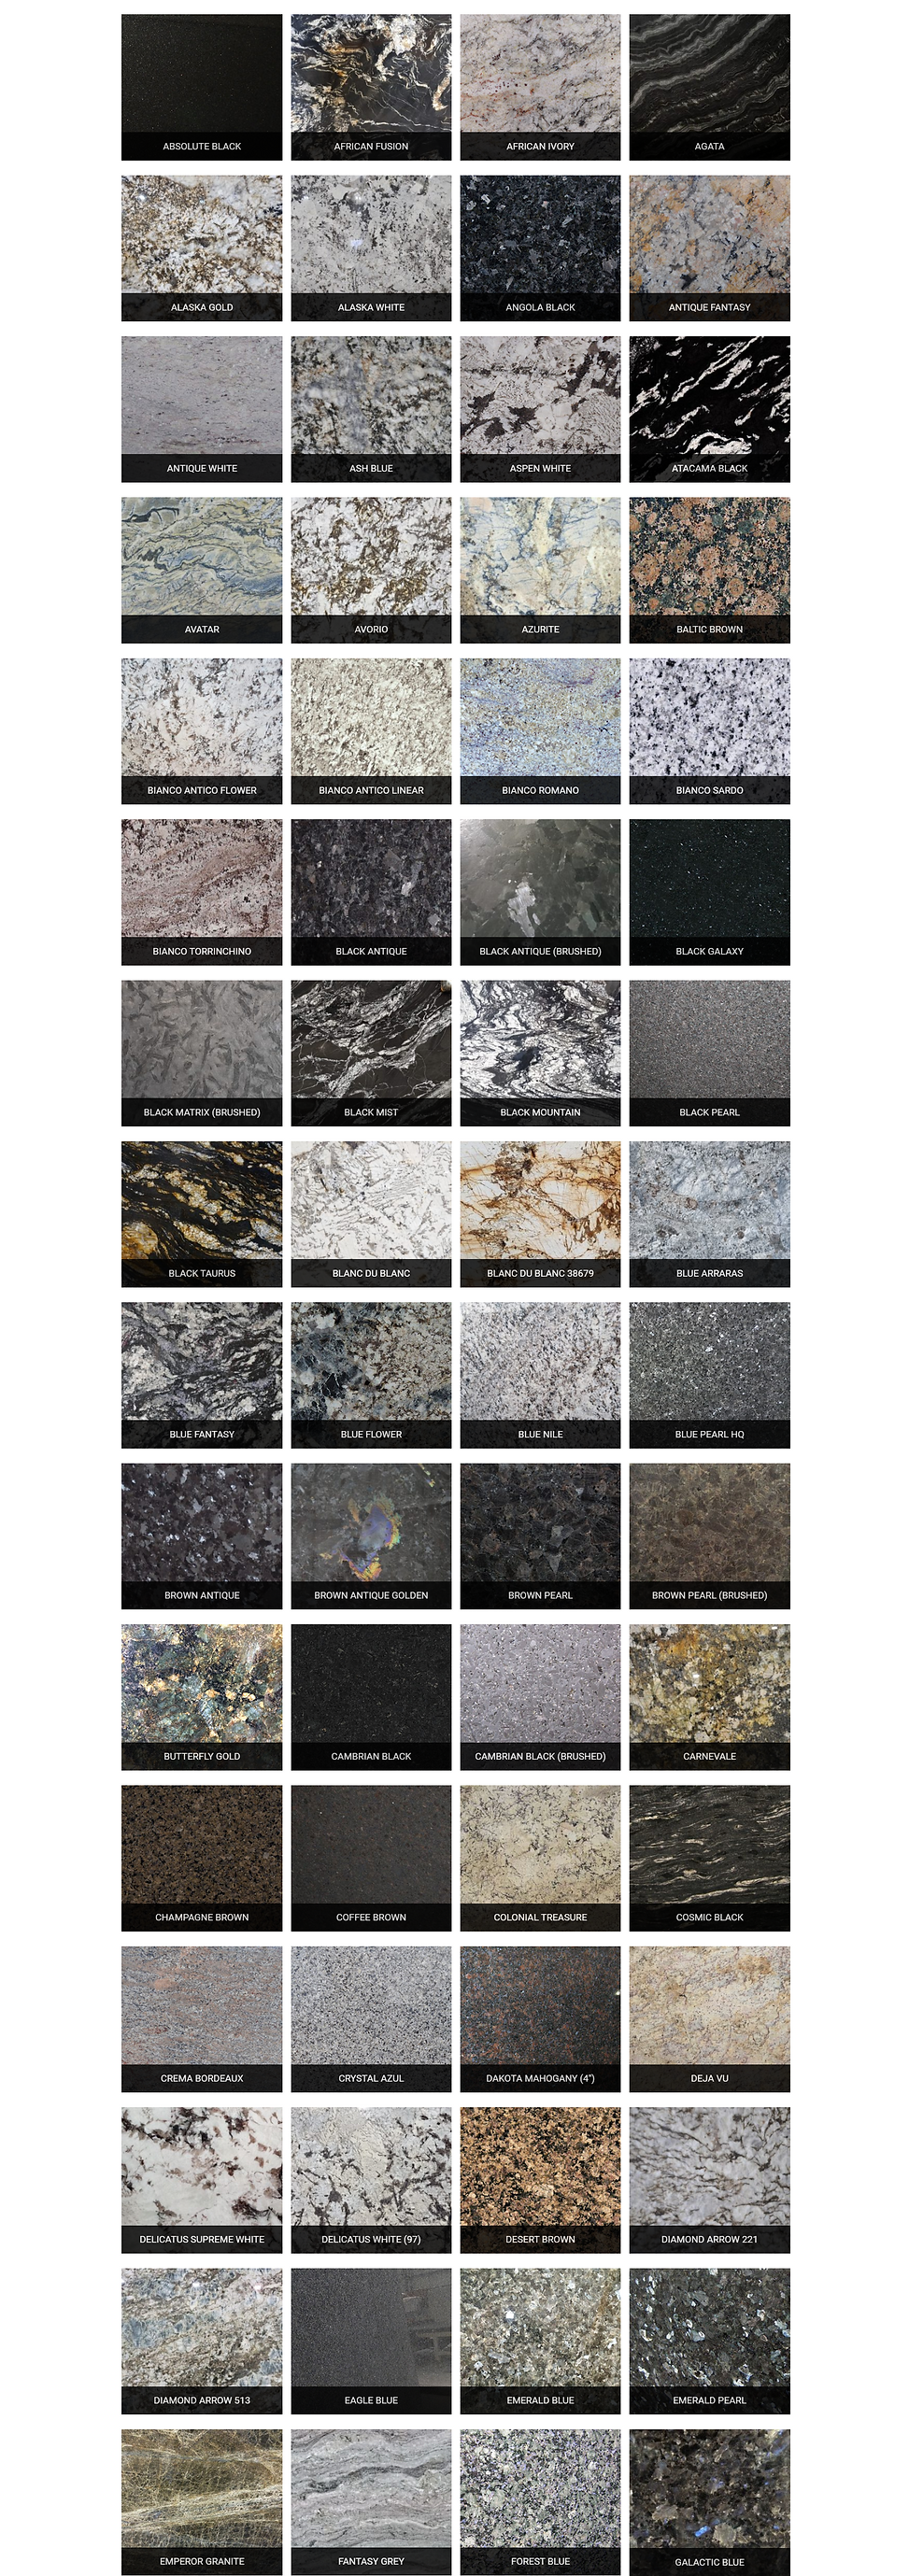 screencapture-westcoast-granite-product-